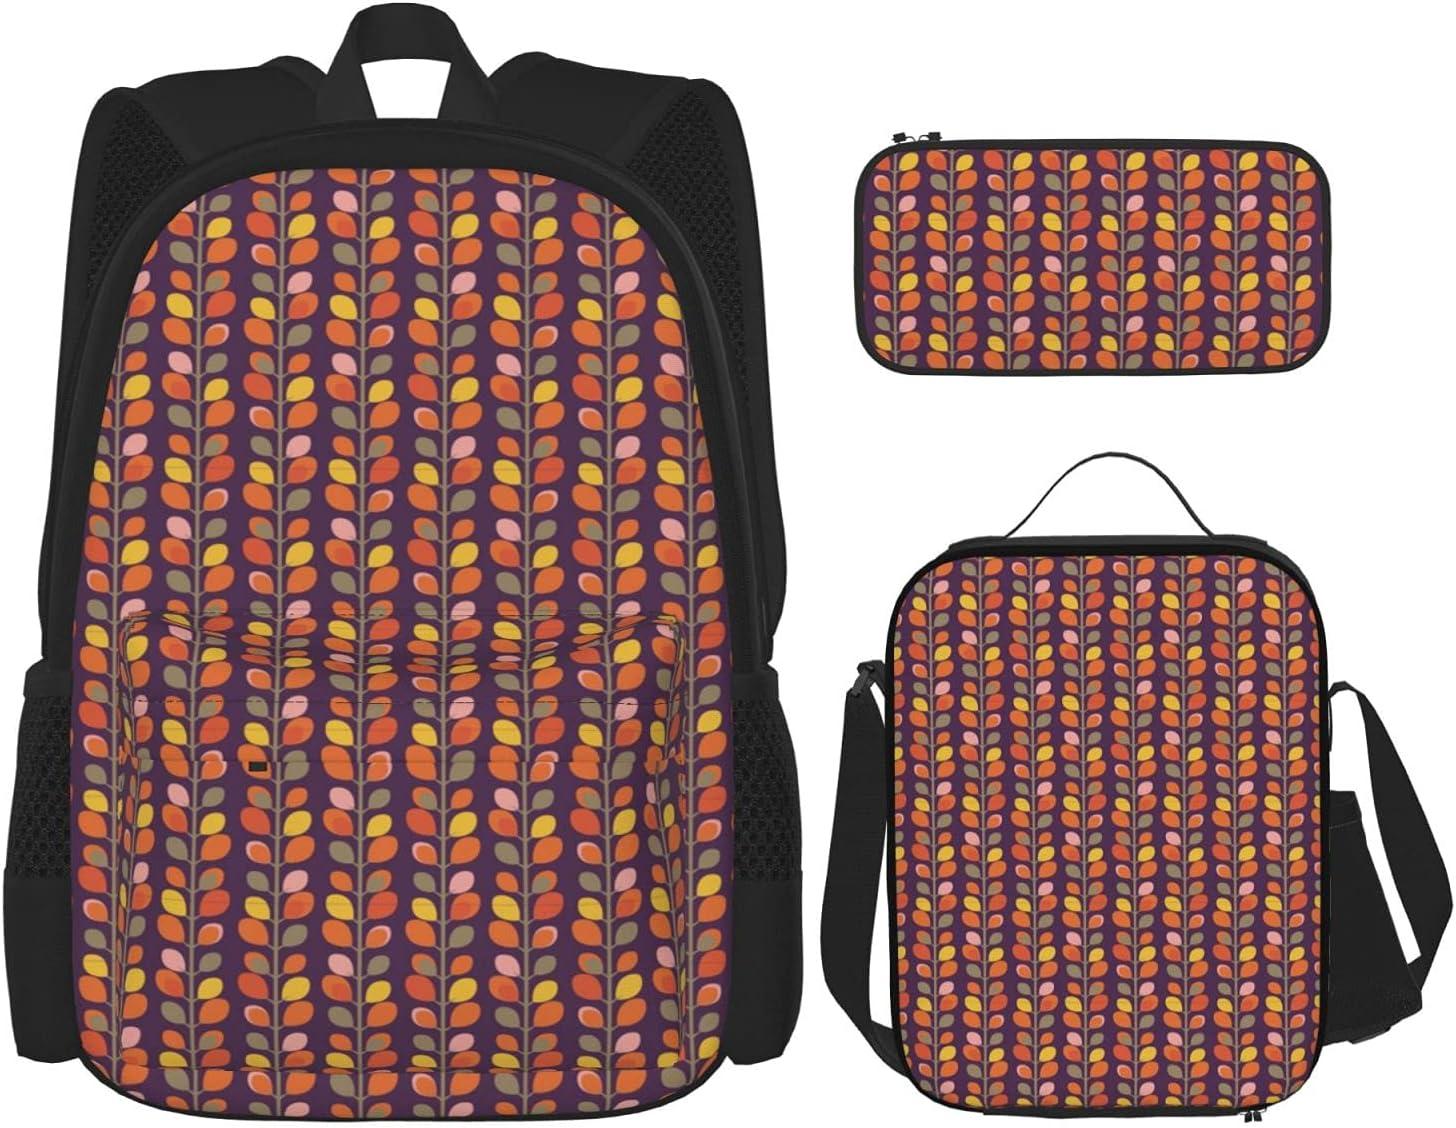 Marat Popular overseas Backpack For Leaves Flower Super popular specialty store Bush Bamboo L Maple Love